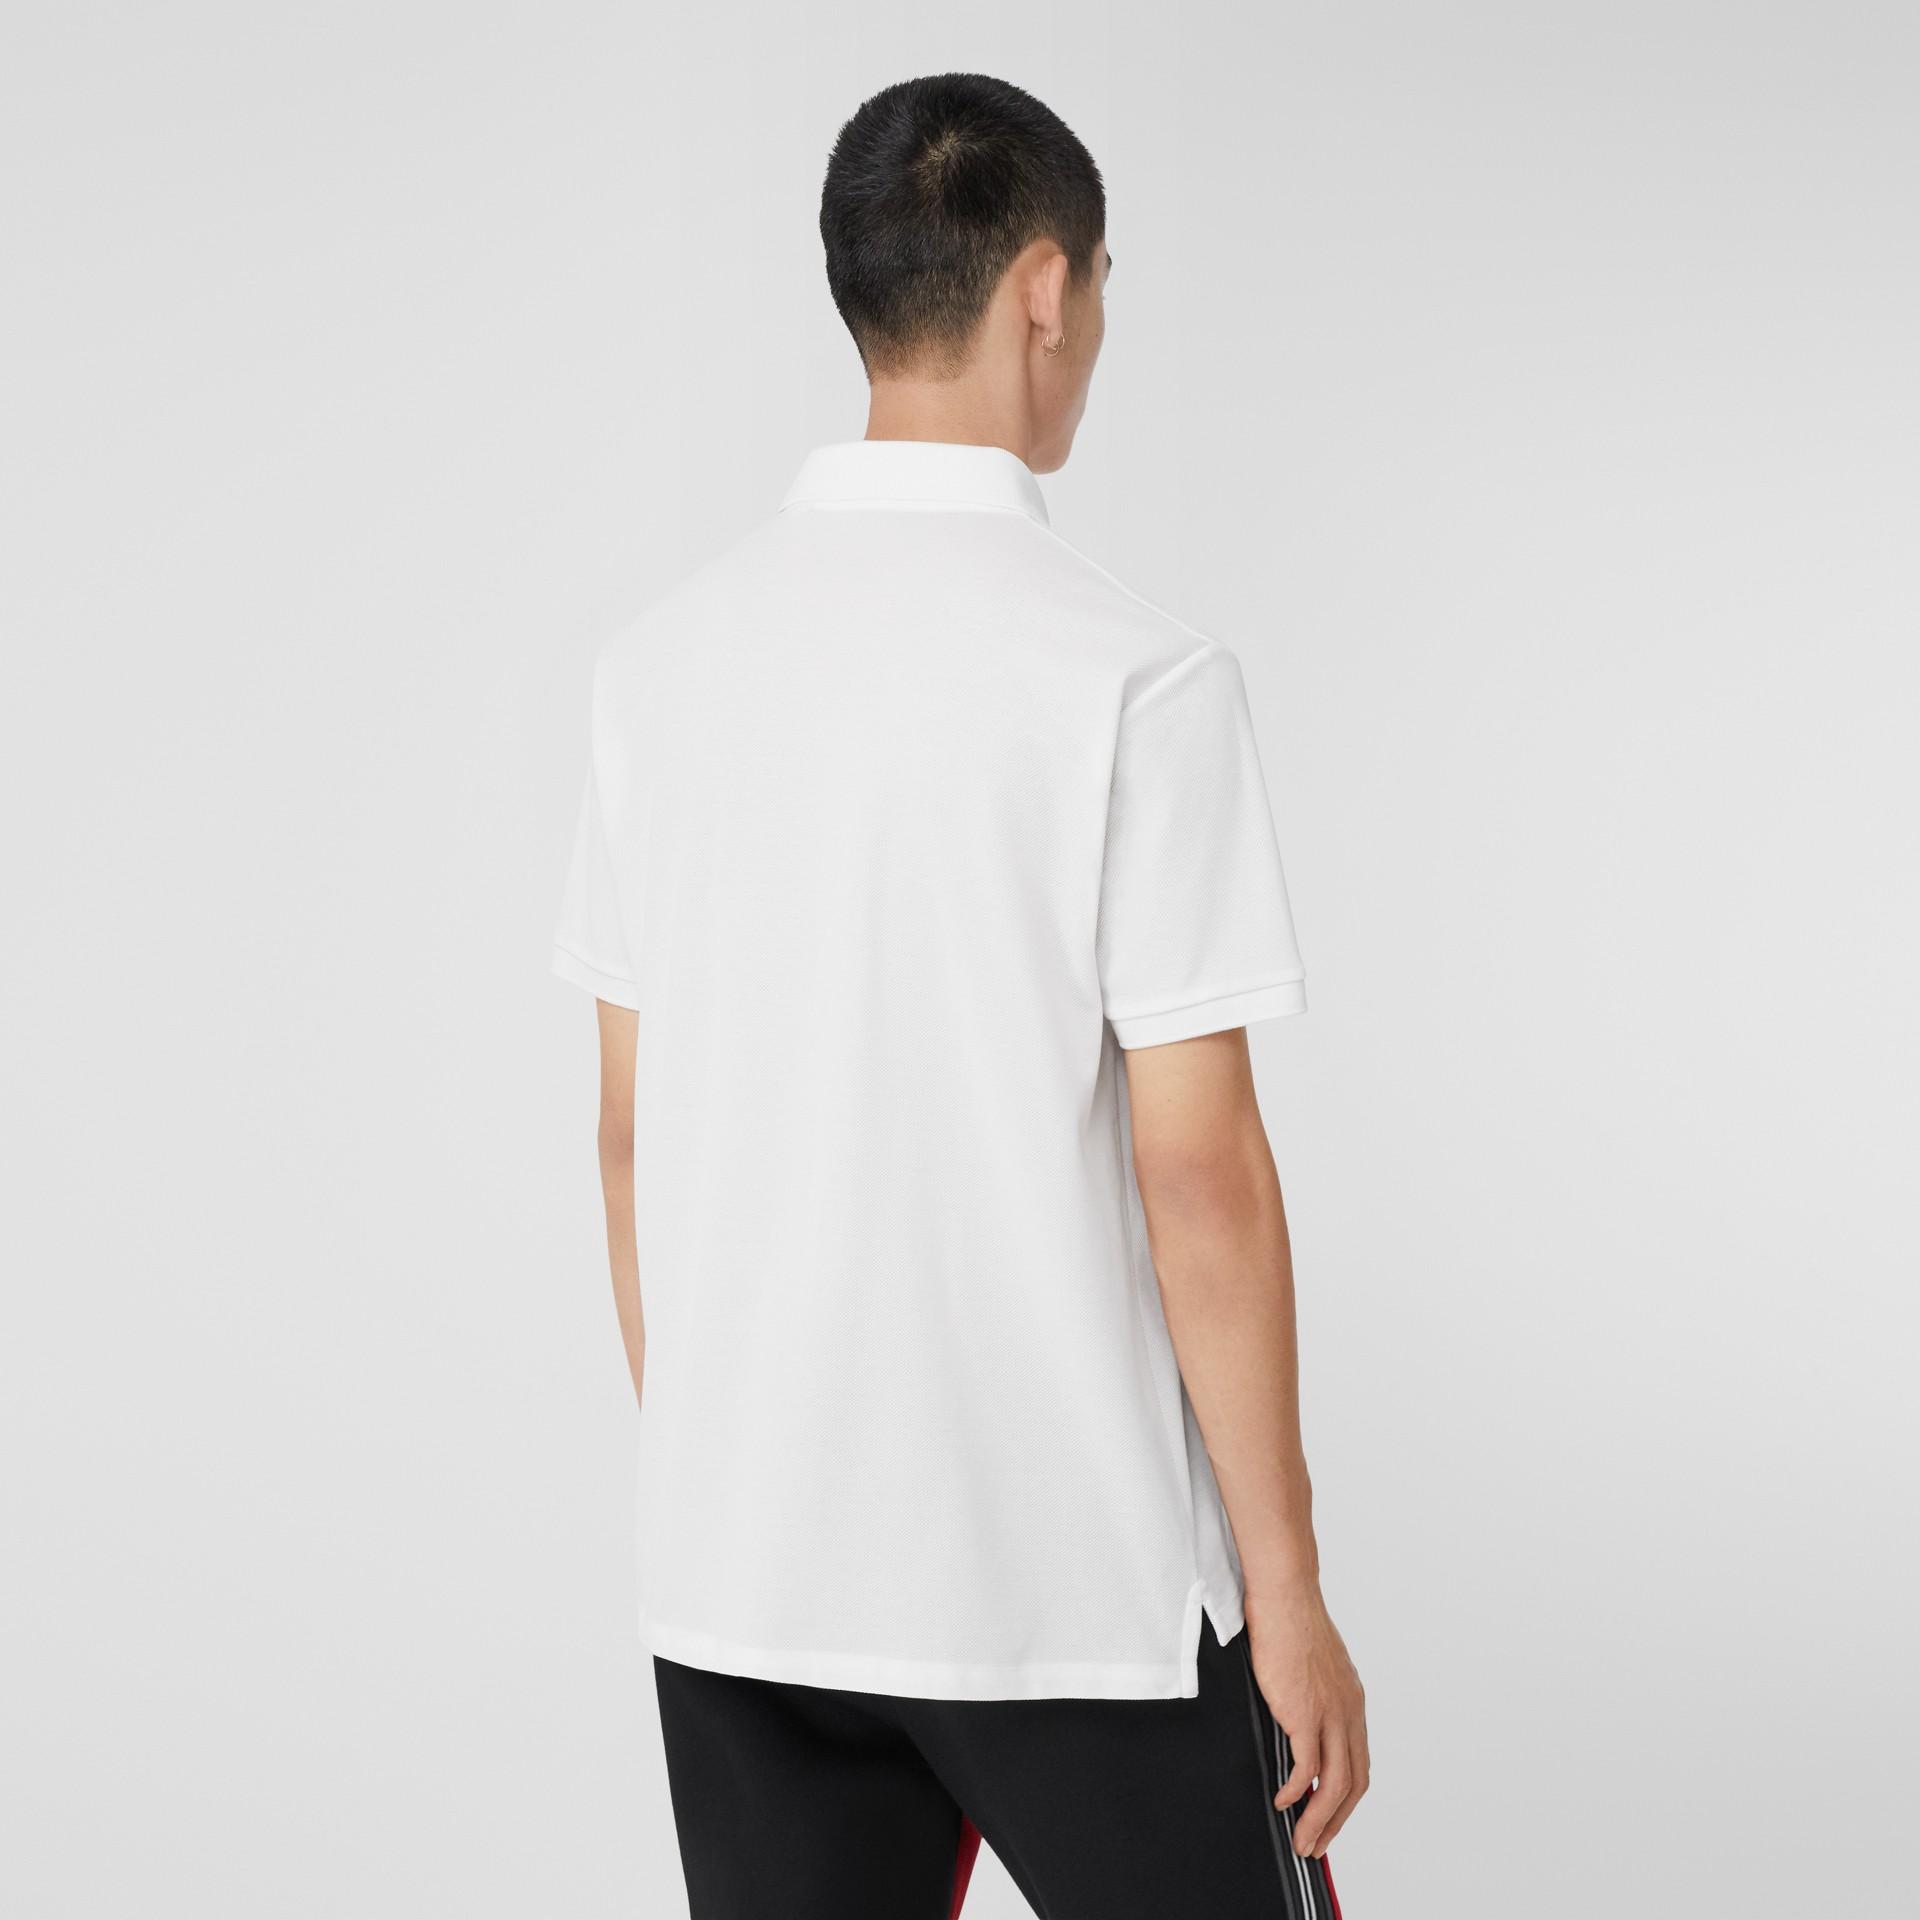 Monogram Motif Cotton Piqué Oversized Polo Shirt in White - Men | Burberry United Kingdom - gallery image 2